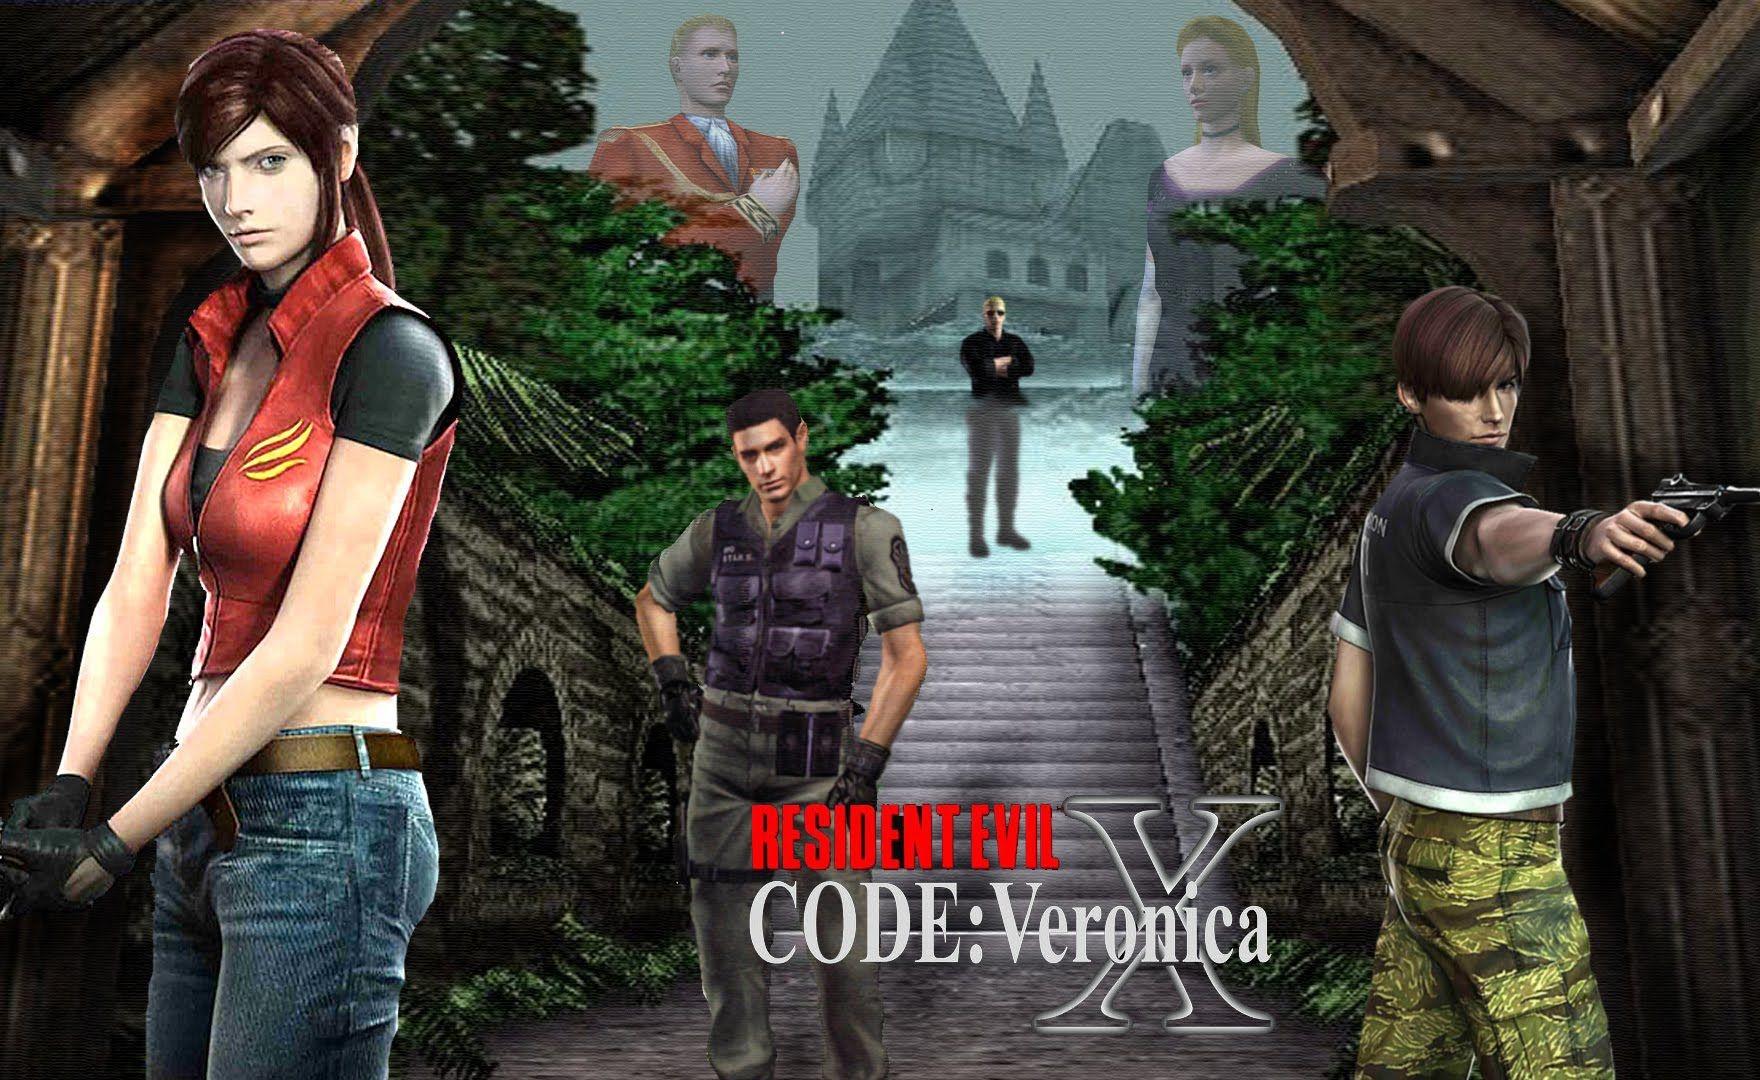 Resident Evil: Code Veronica Remake è nei piani di Capcom